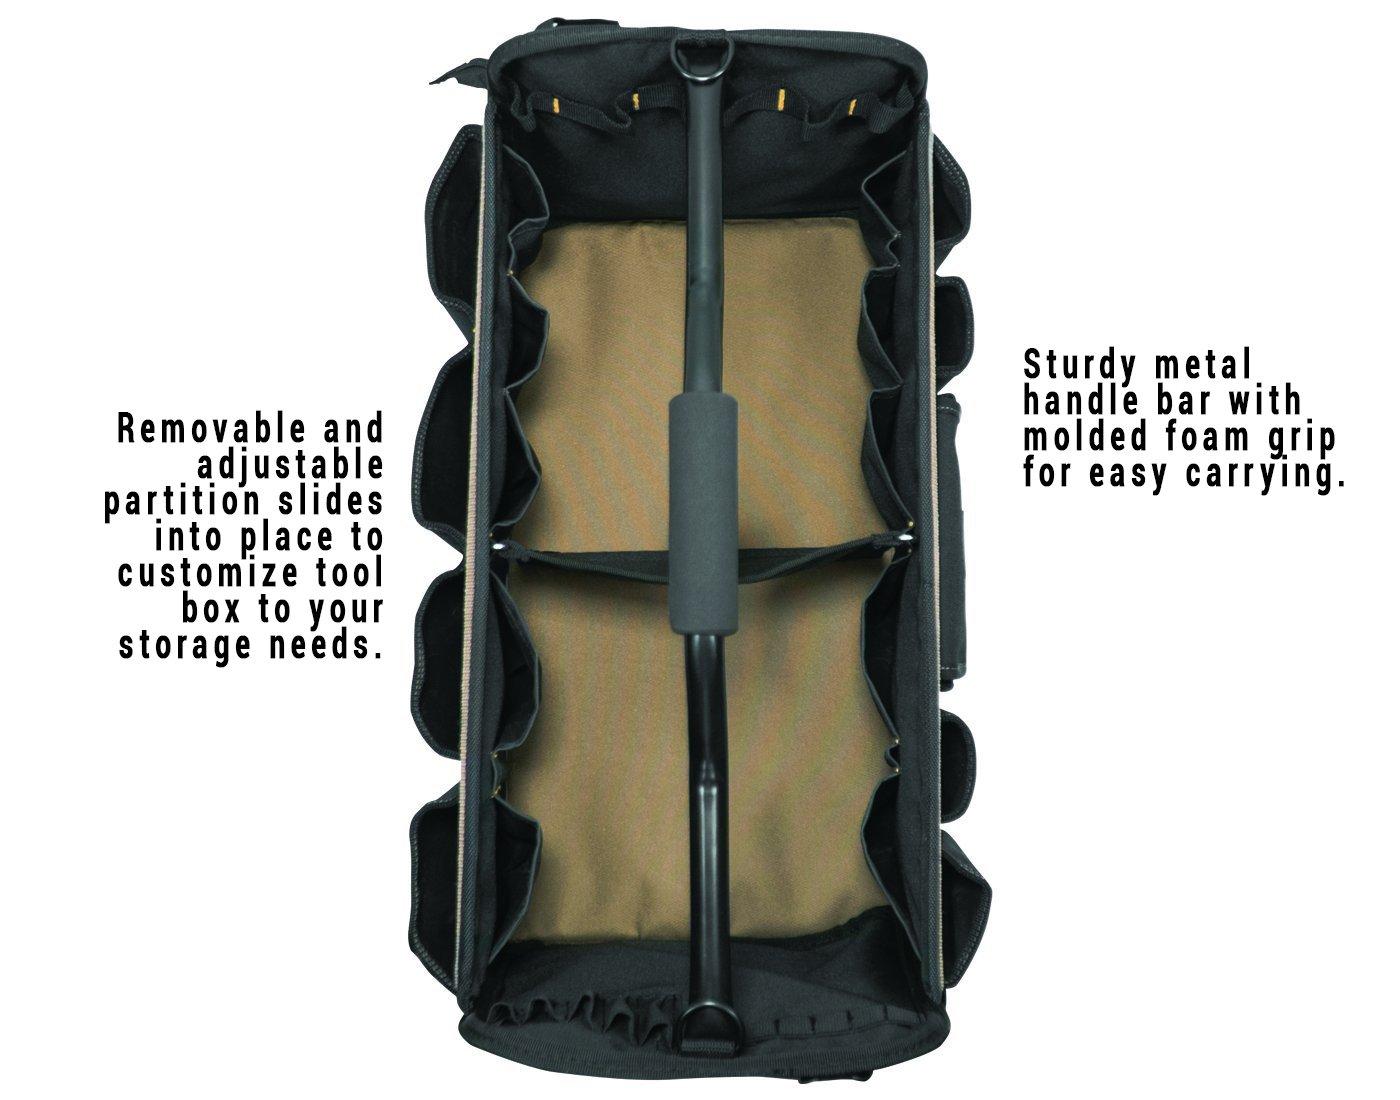 CLC Custom Leathercraft 1579 20 Inch, Open Top, Soft Sided Tool Box, 27 Pockets by Custom Leathercraft (Image #2)